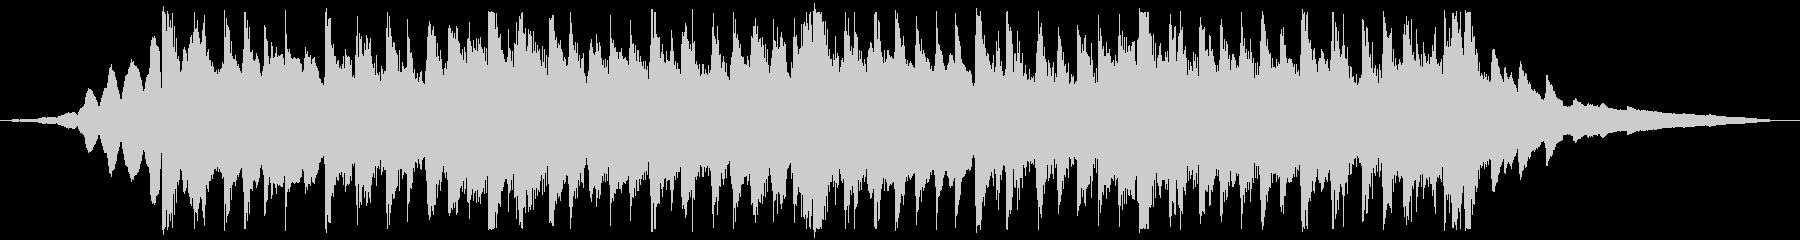 CM用22秒、次世代、スタイリッシュ製品の未再生の波形